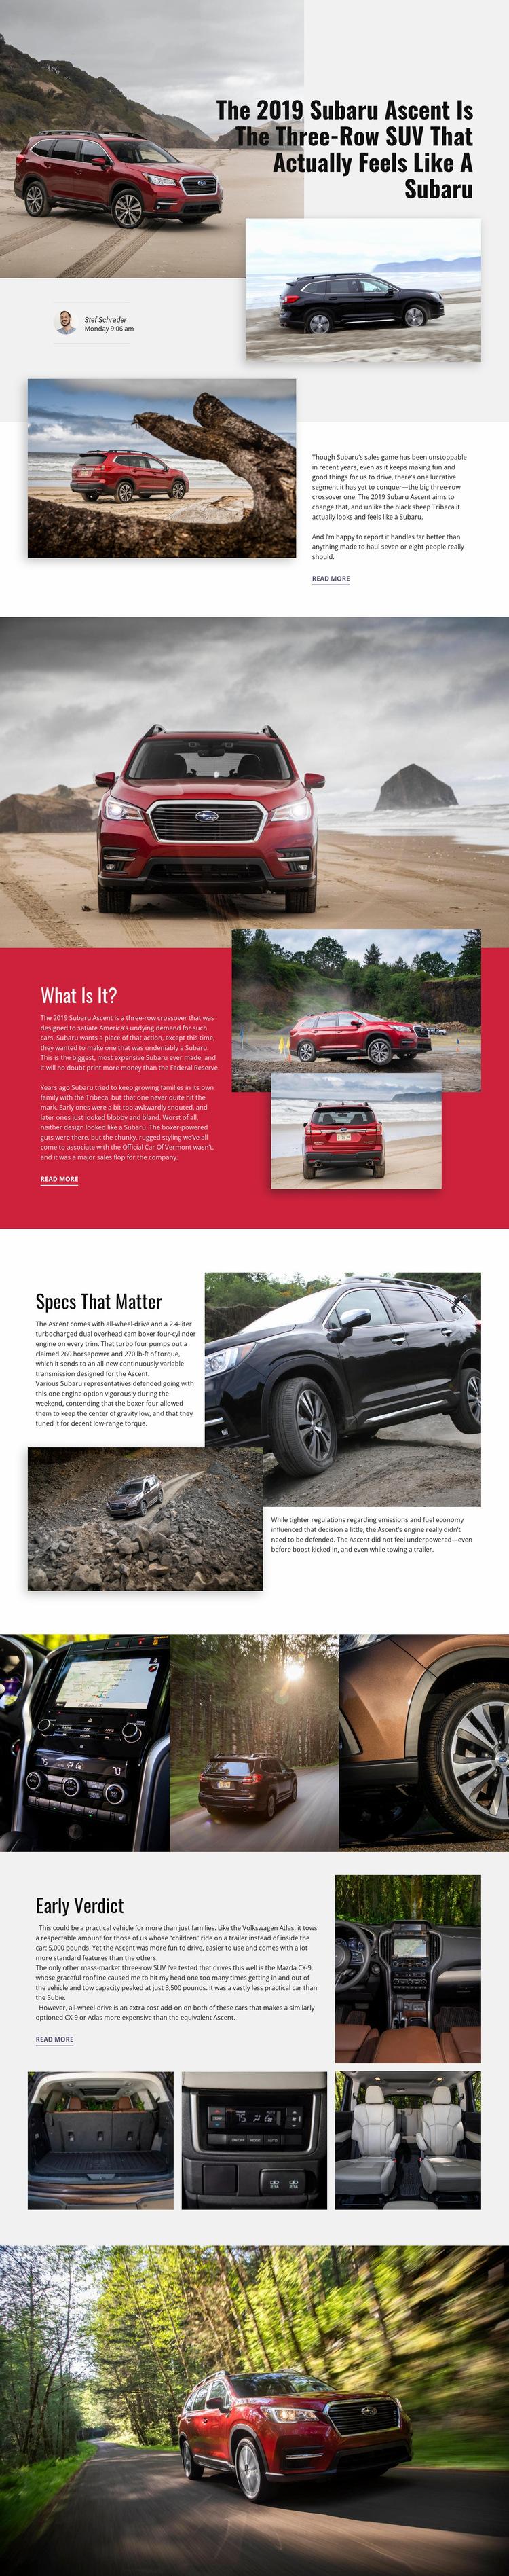 Subaru Website Builder Templates